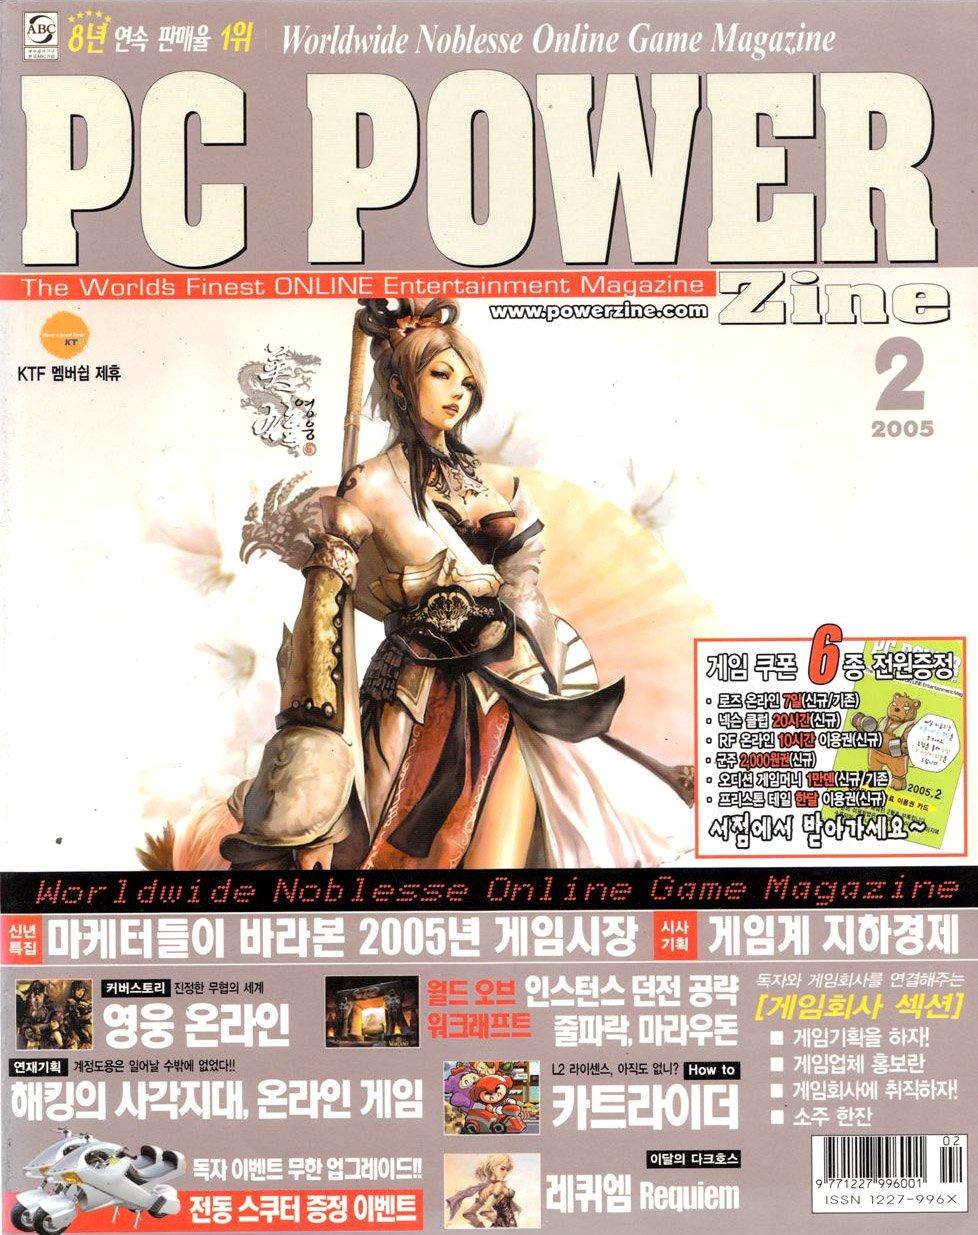 PC Power Zine Issue 115 (February 2005)